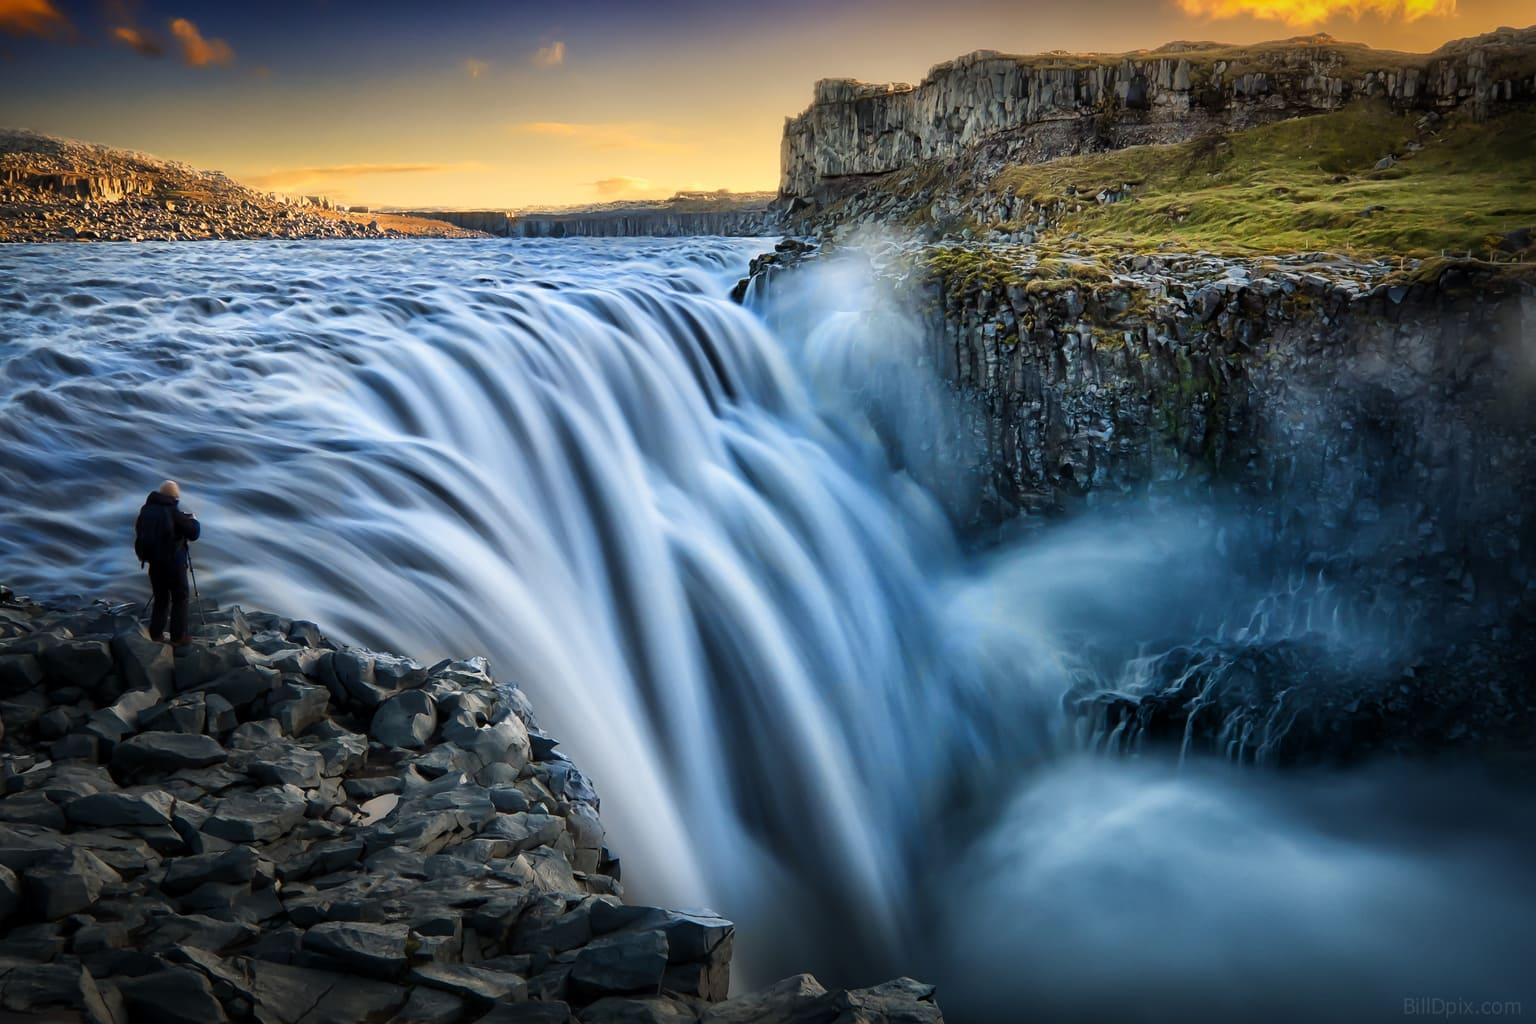 11 Consejos Para Fotografiar Impresionantes Cataratas Con